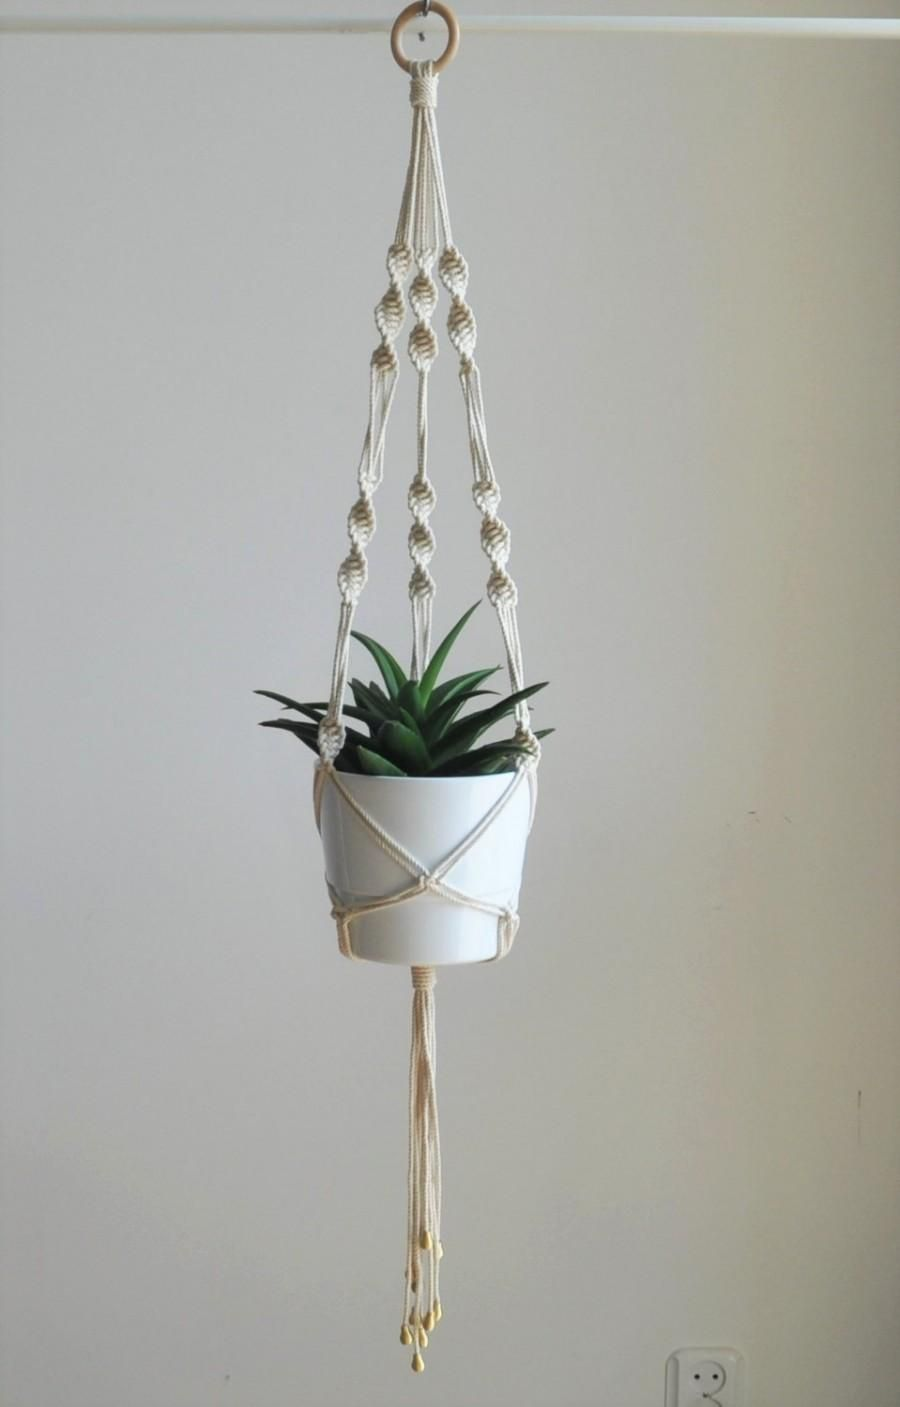 Wedding Plant Hanger, Macrame Plant Hanger, Boho Wedding, Indoor Garden  Planter, Plant Pot Hanger, Rope Macrame Planter, Boho Home Decor